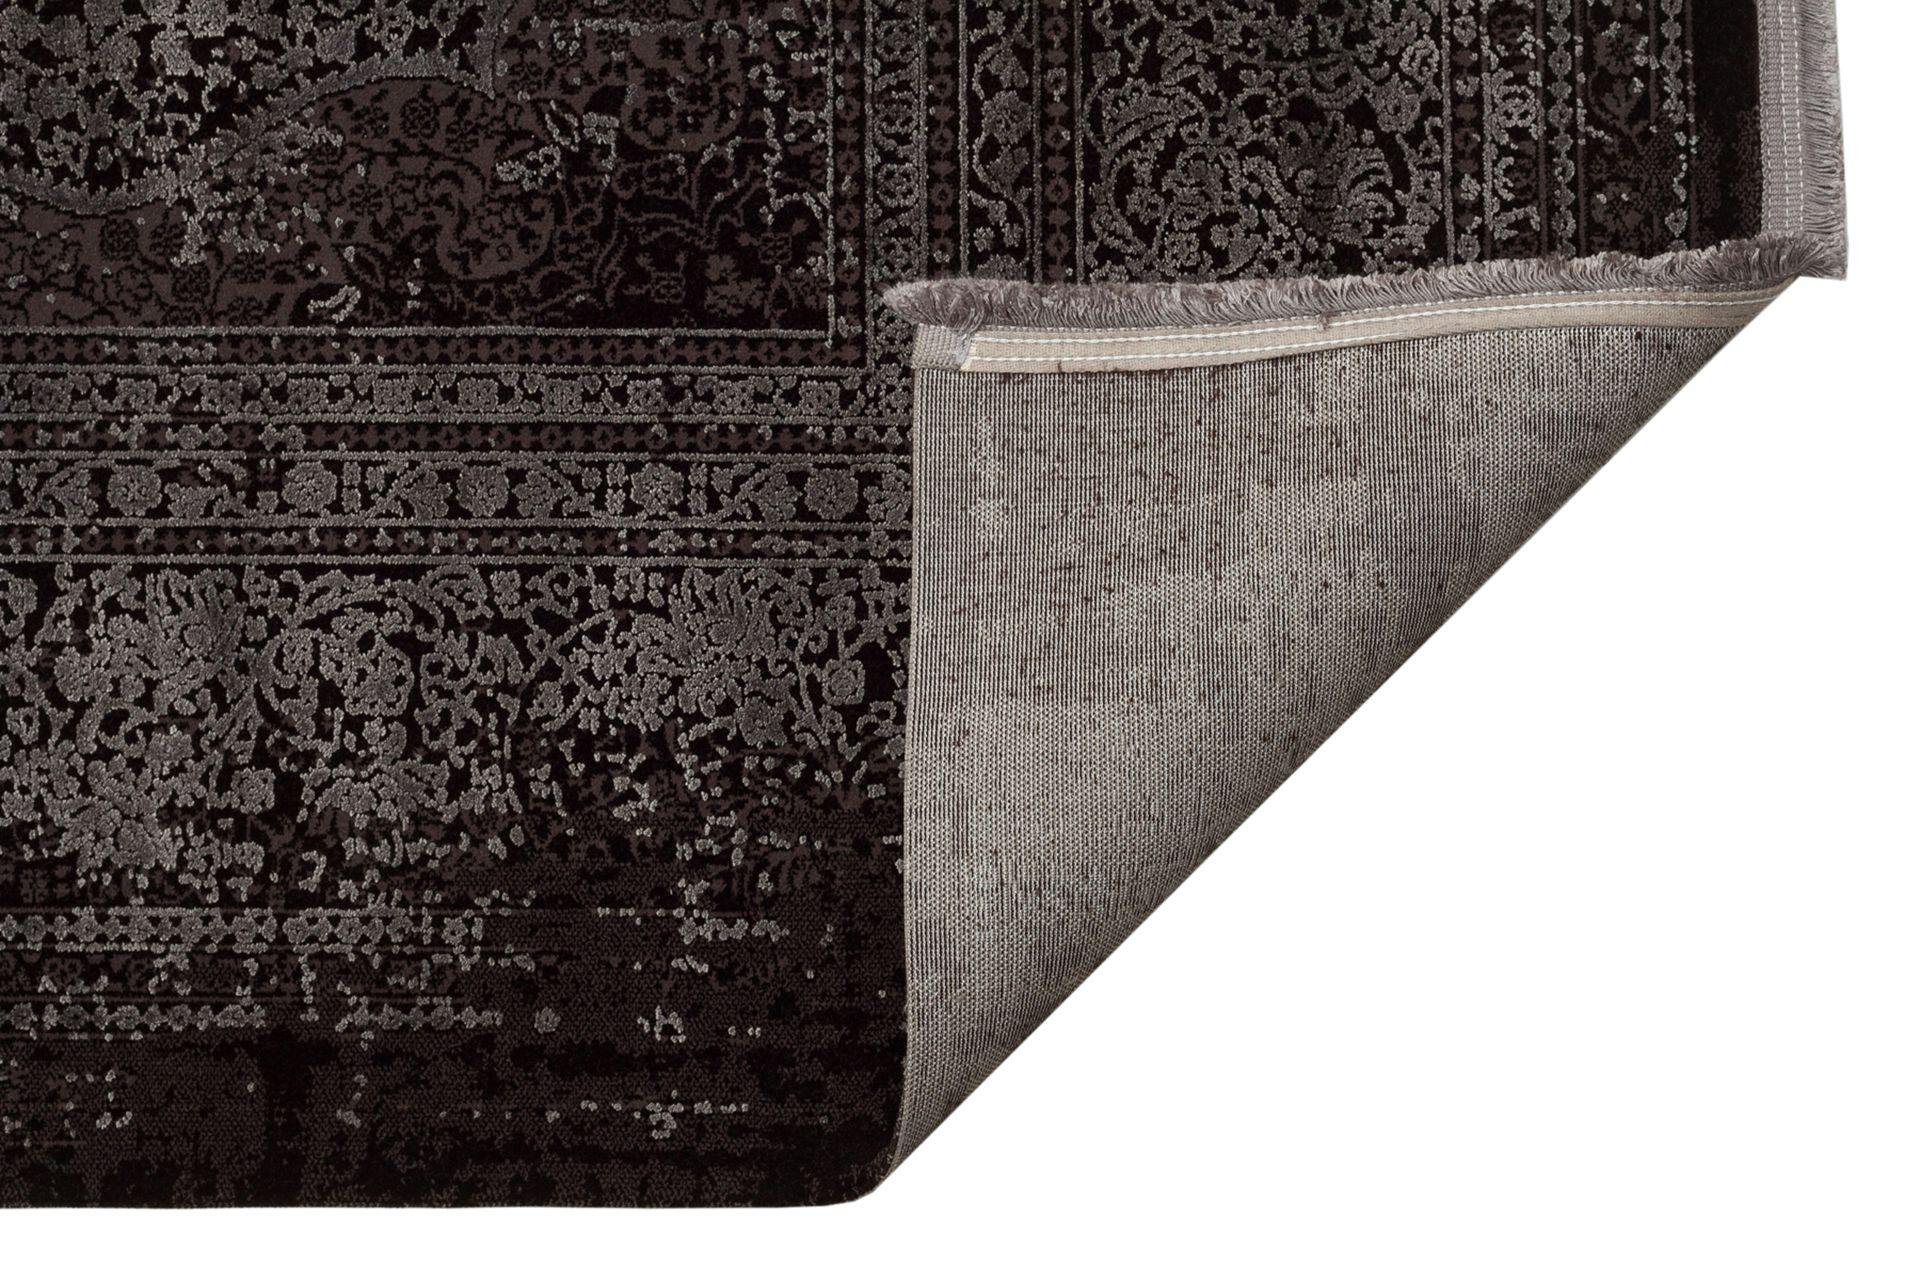 ANADOLU AD 01 ANTRASİT GRİ KLASİK DESENLİ SALON HALISI 160X230